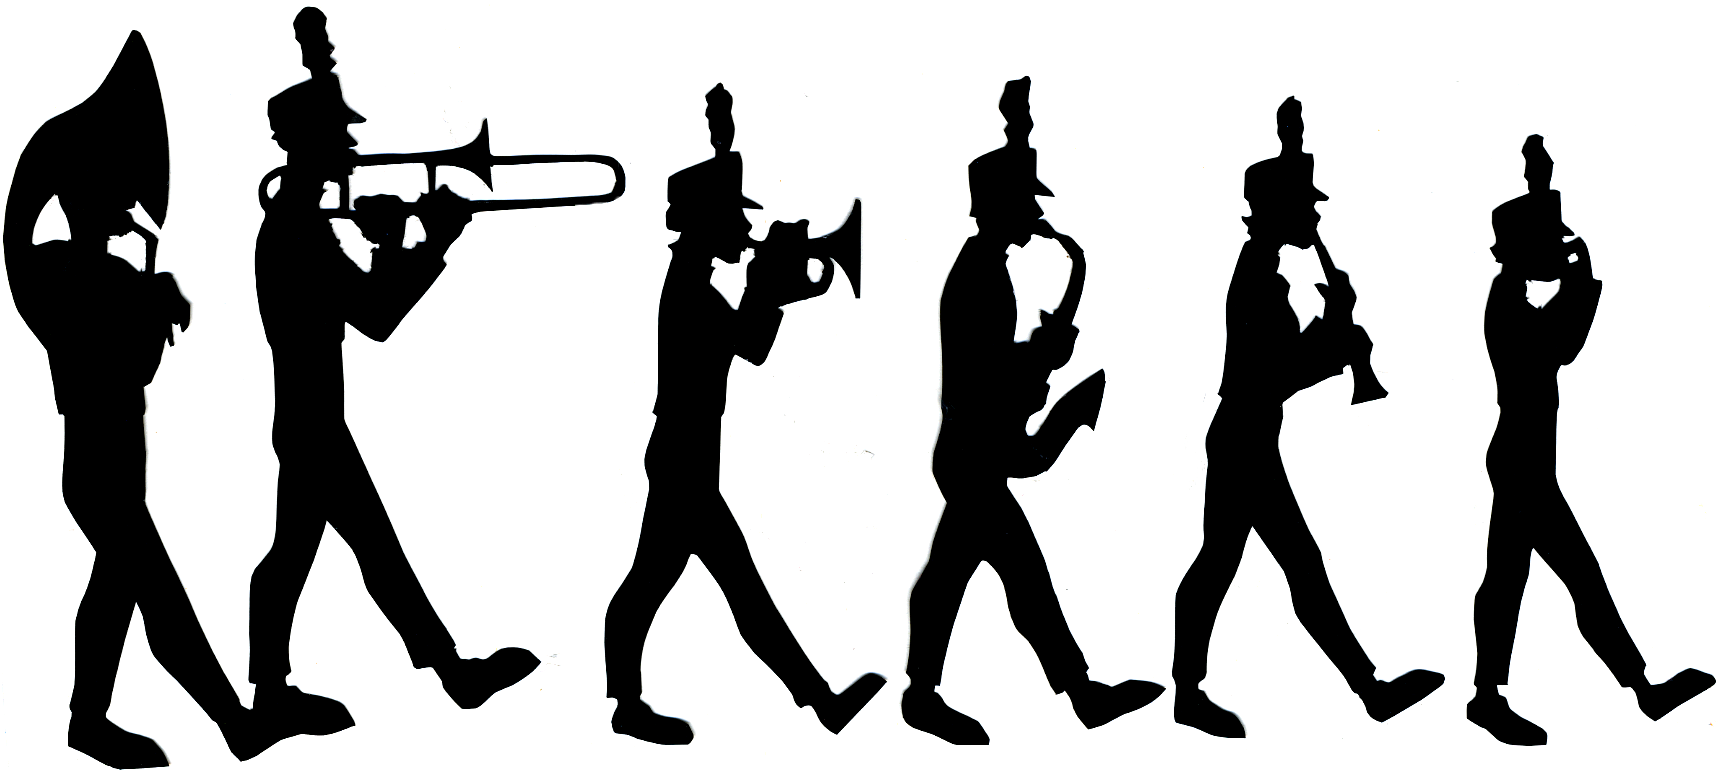 Band clipart marching band. Look at clip art